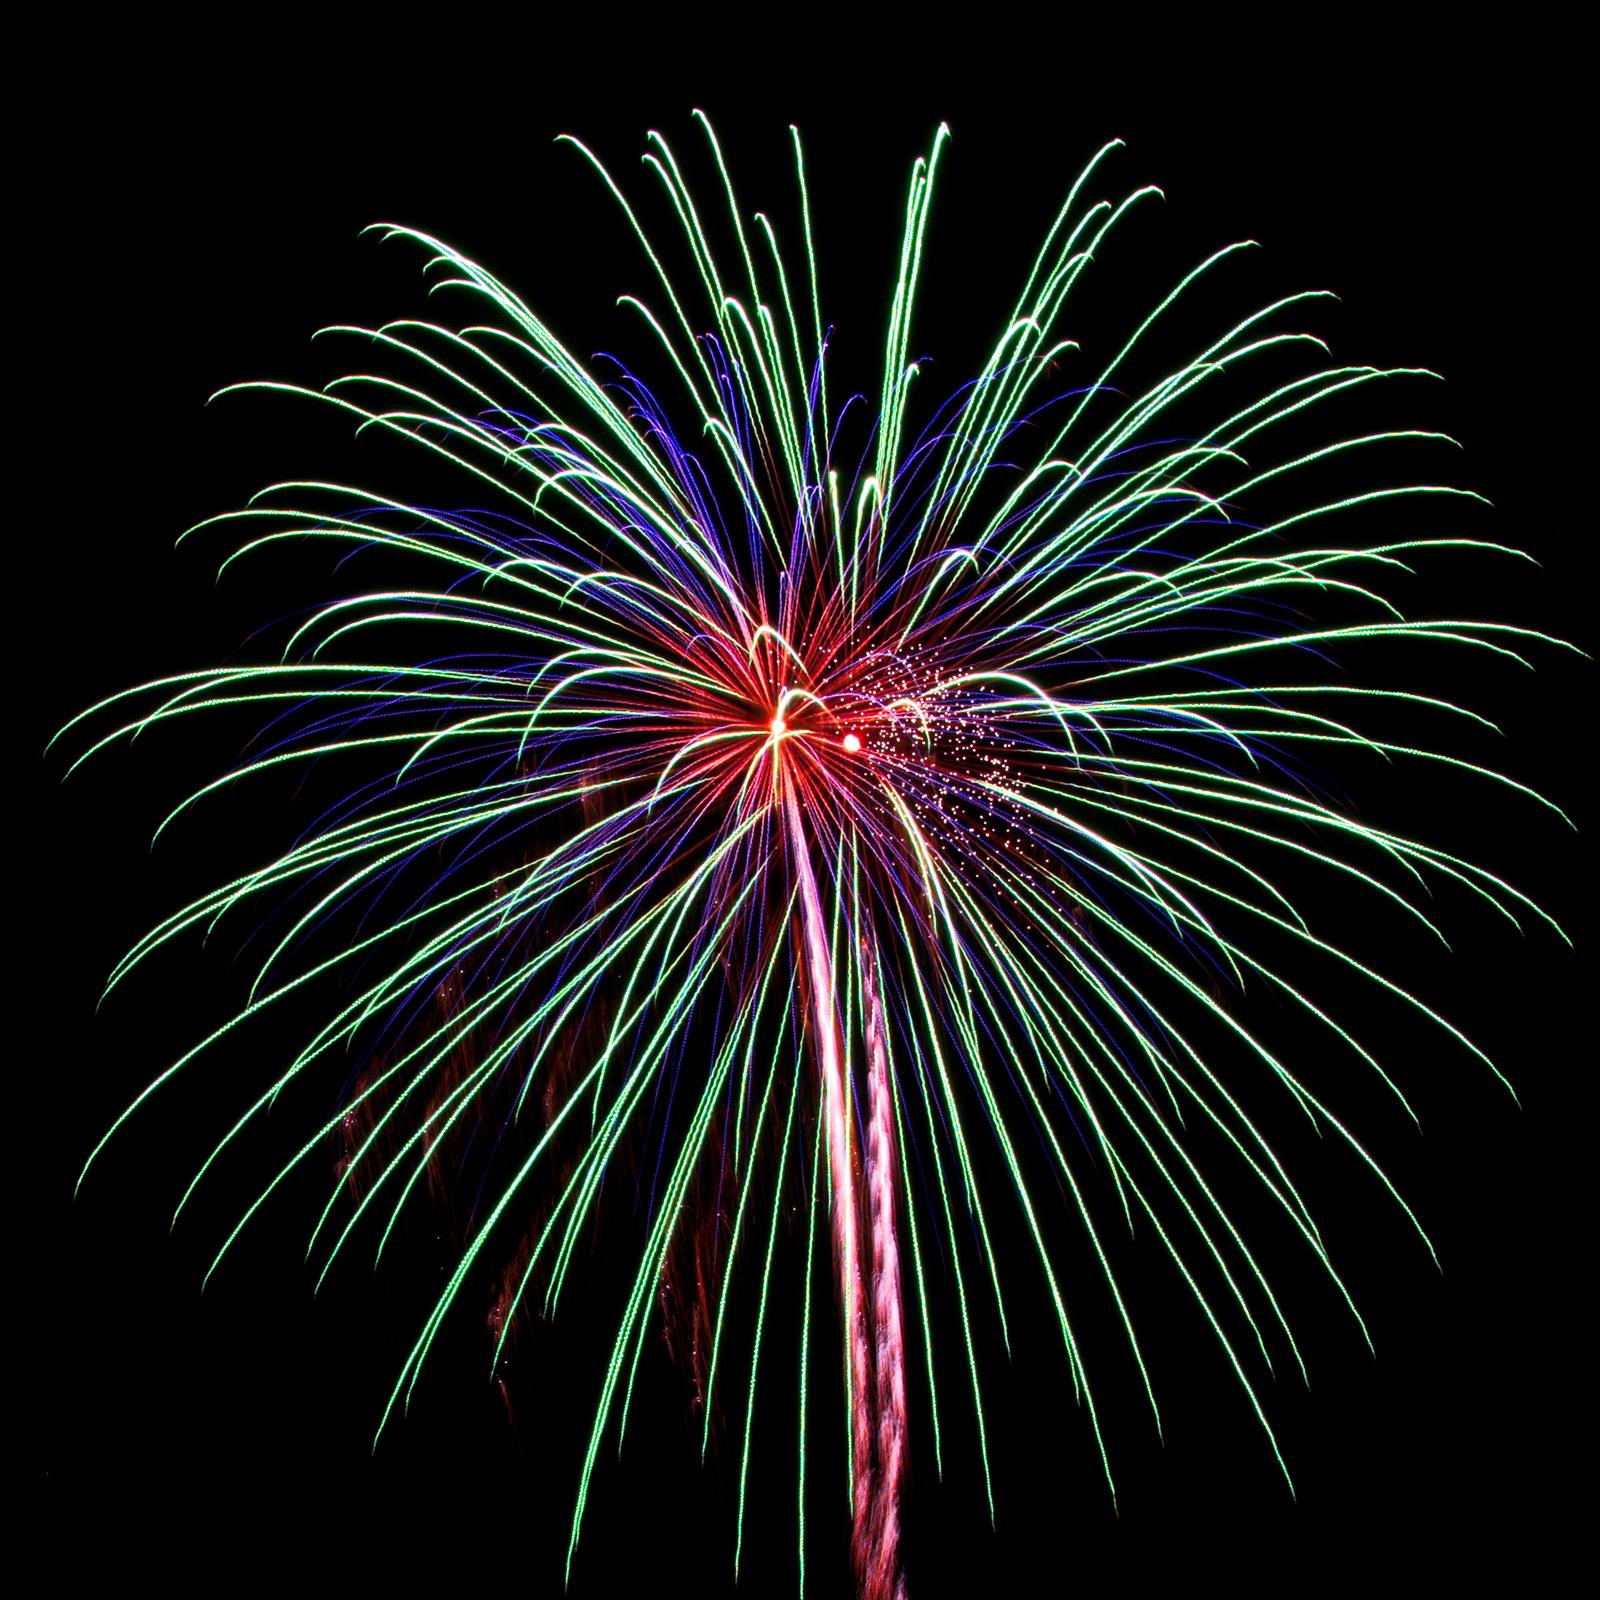 Cape Cod Fireworks: Magnificent multicolor burst